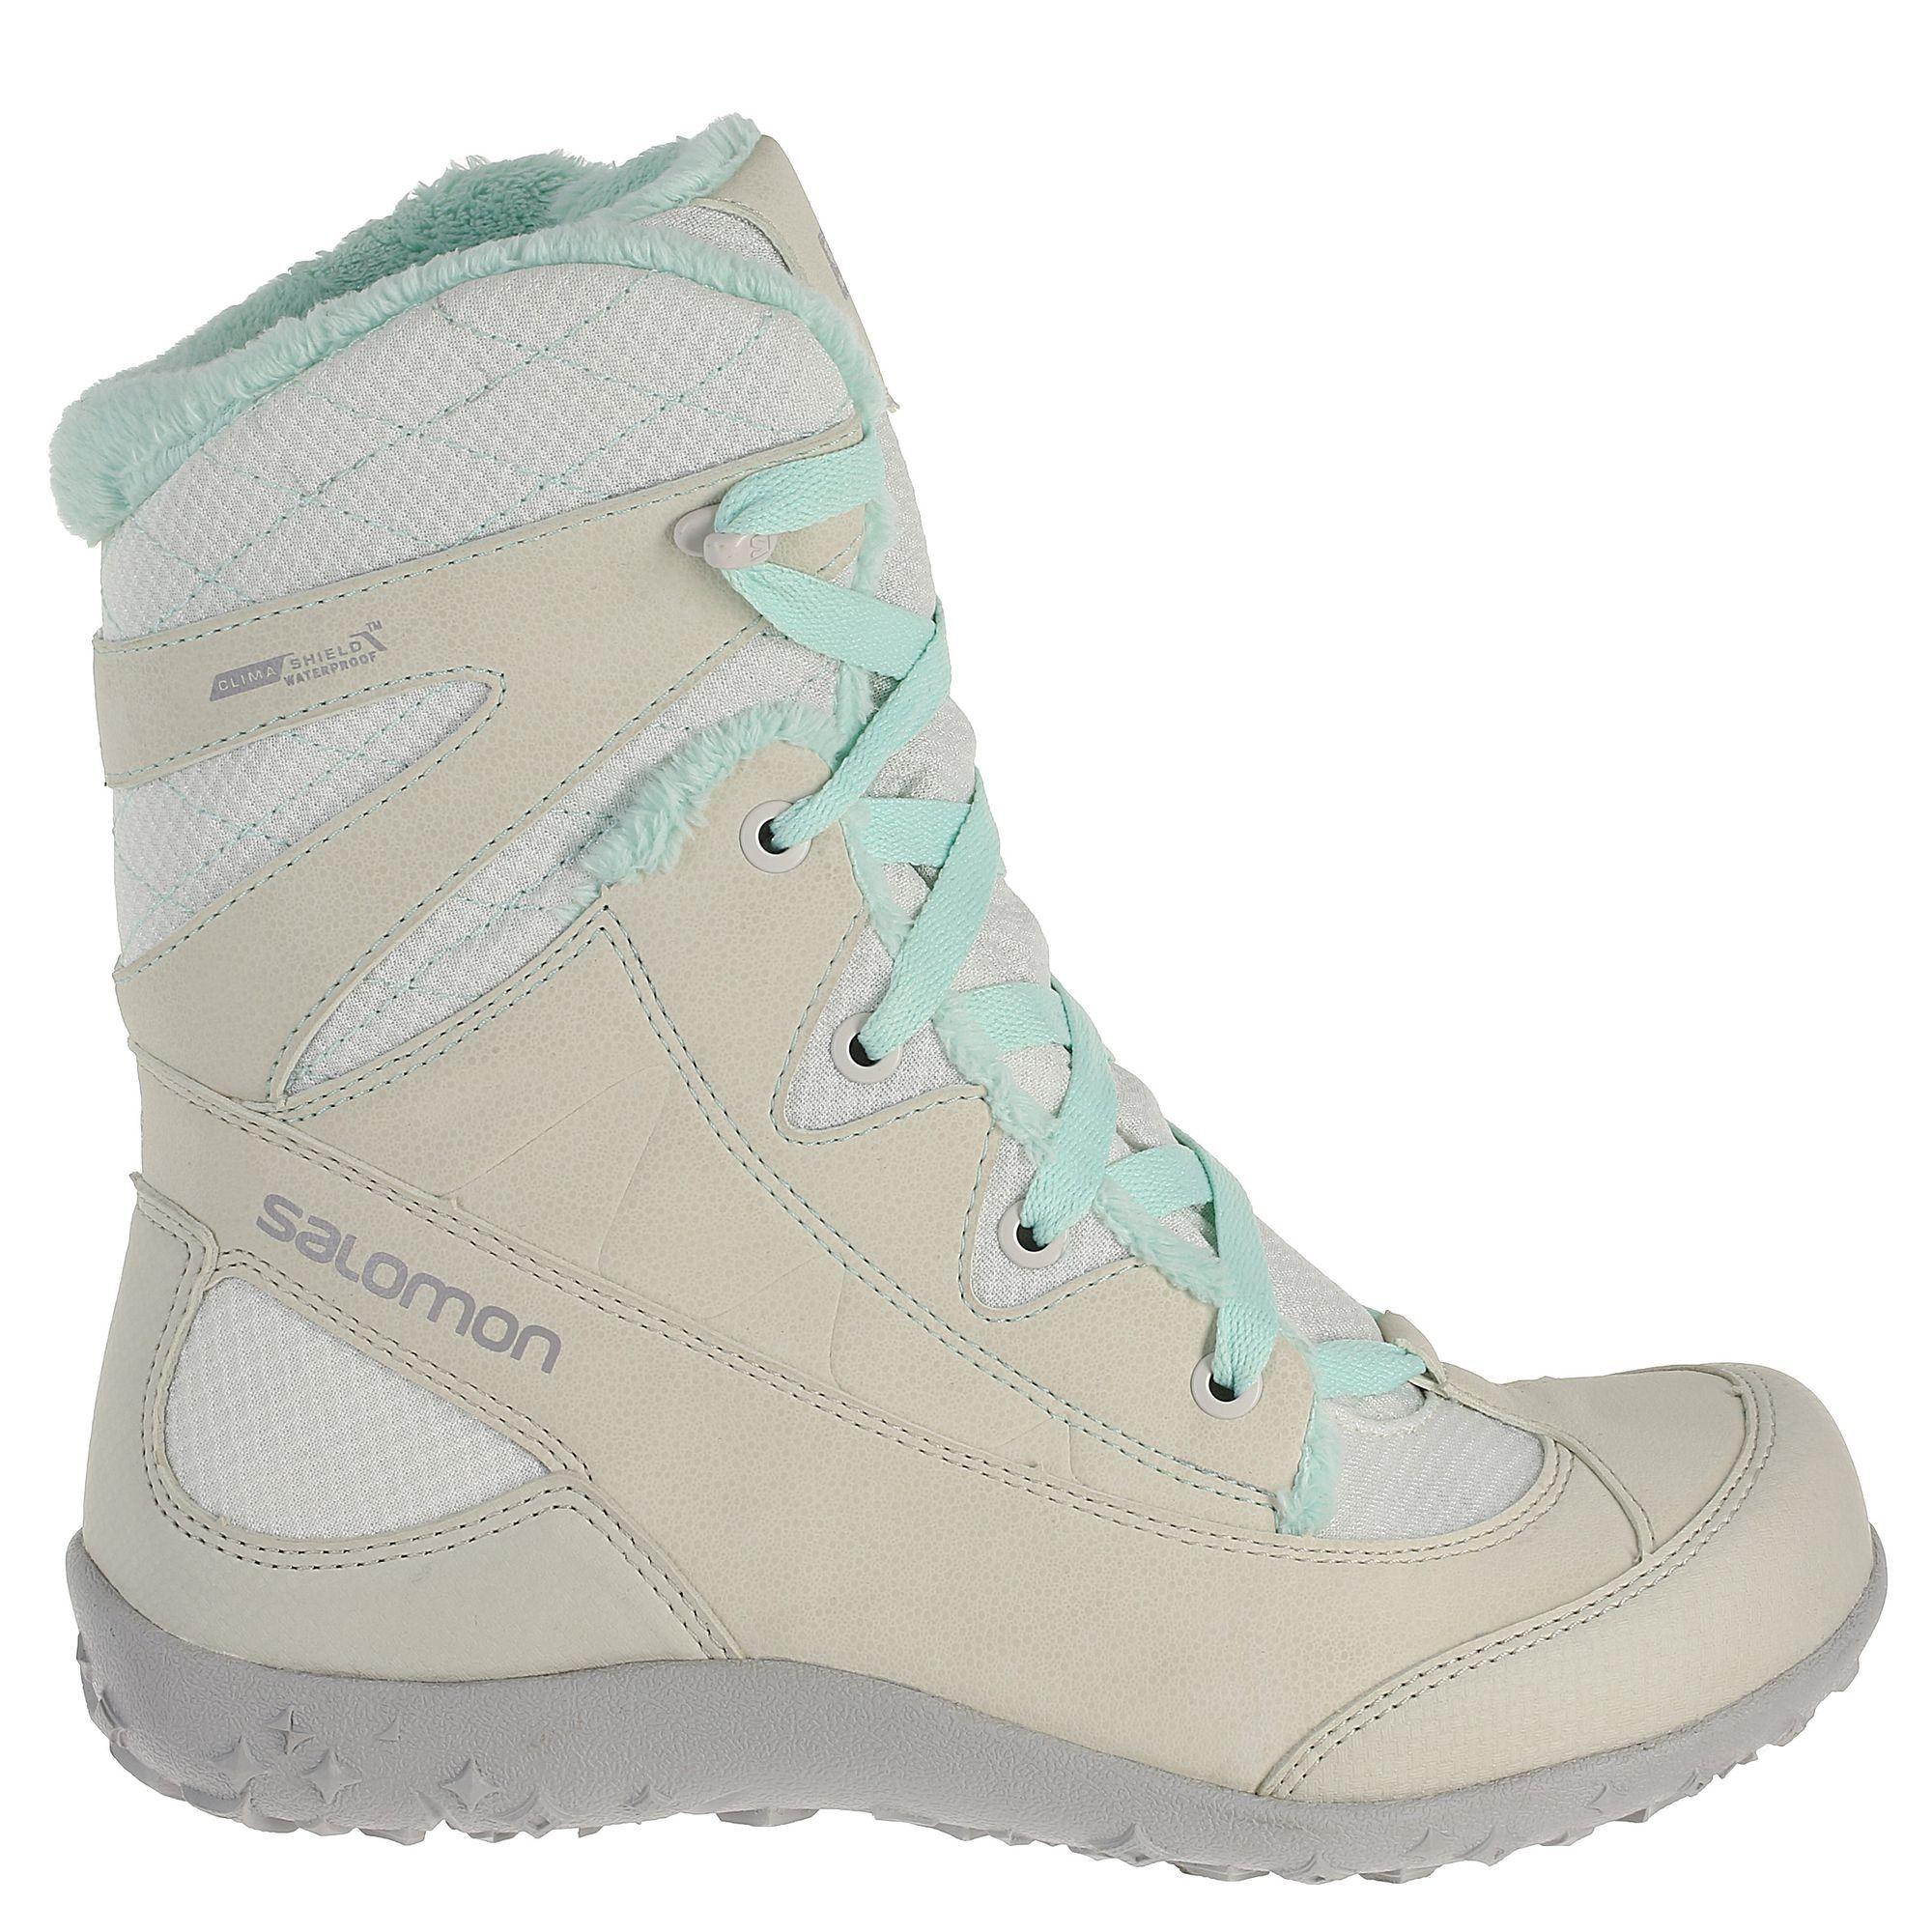 Hiking On Salomon Shoes Imperia Boots HikingClimbingTrail rsBtQCxohd